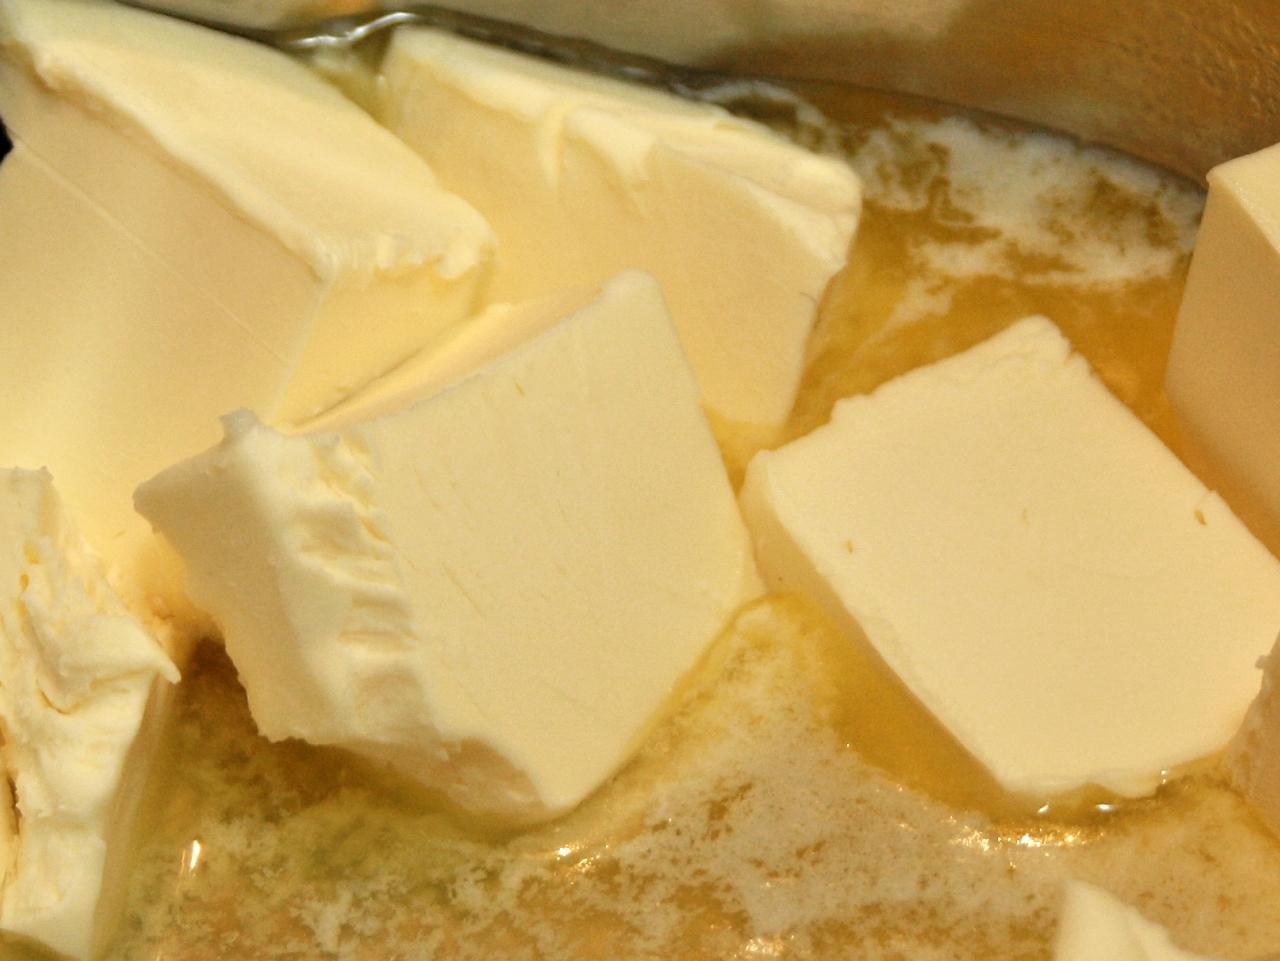 Butter Wikipedia